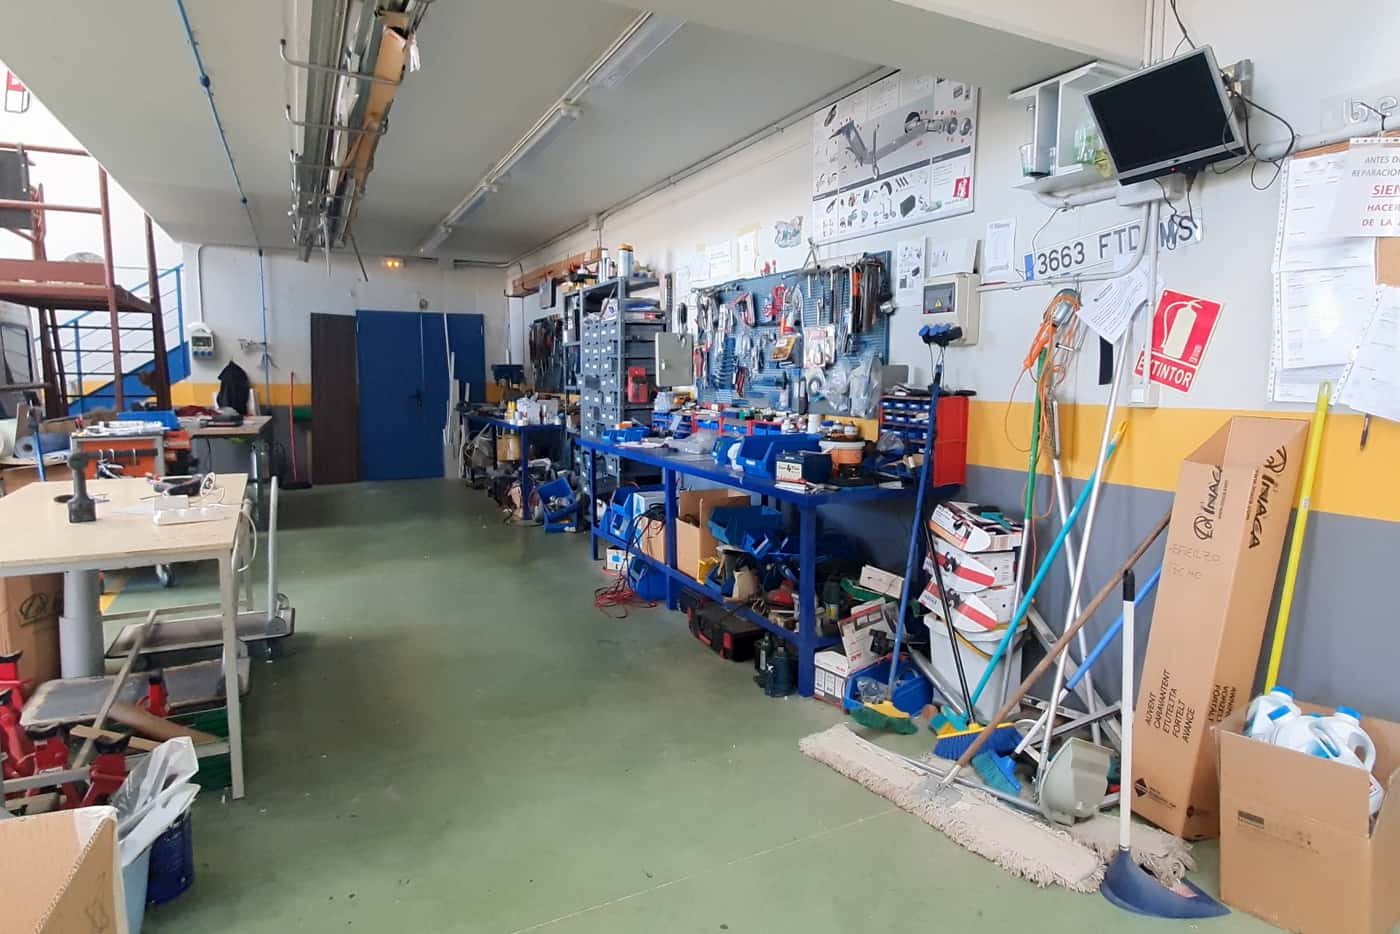 taller de caravanas